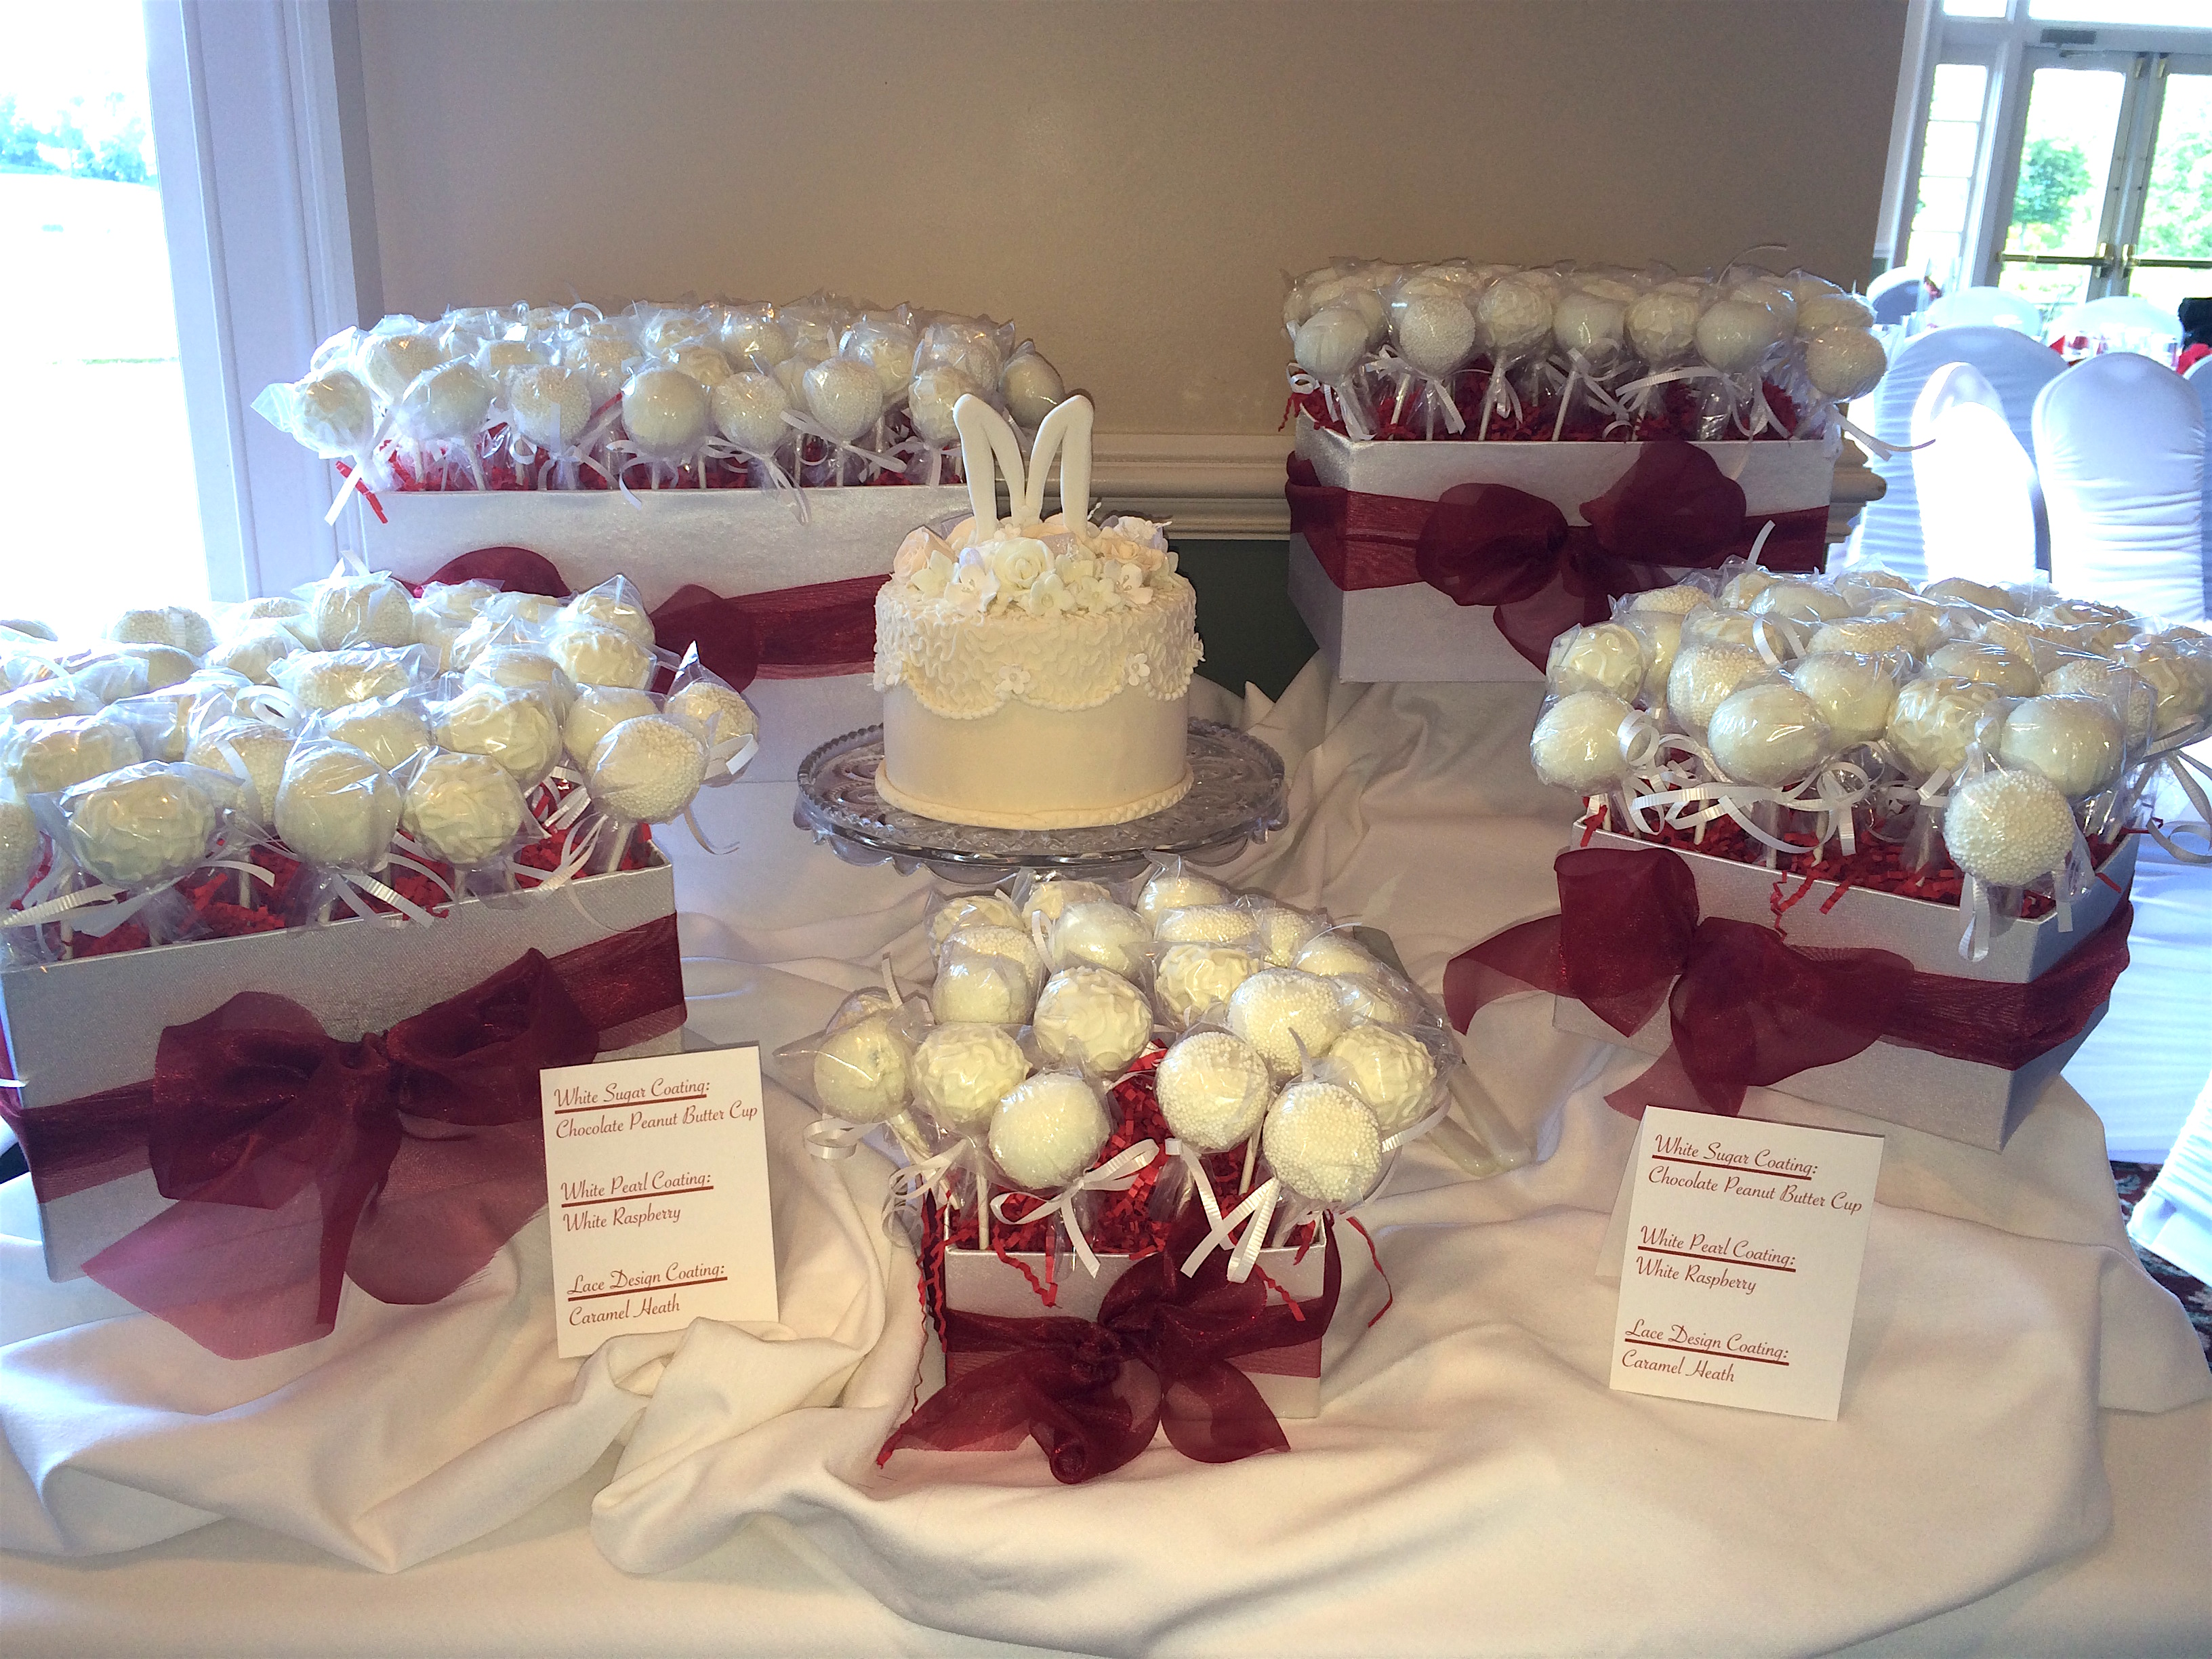 Wedding Cake wCakepops1 Display